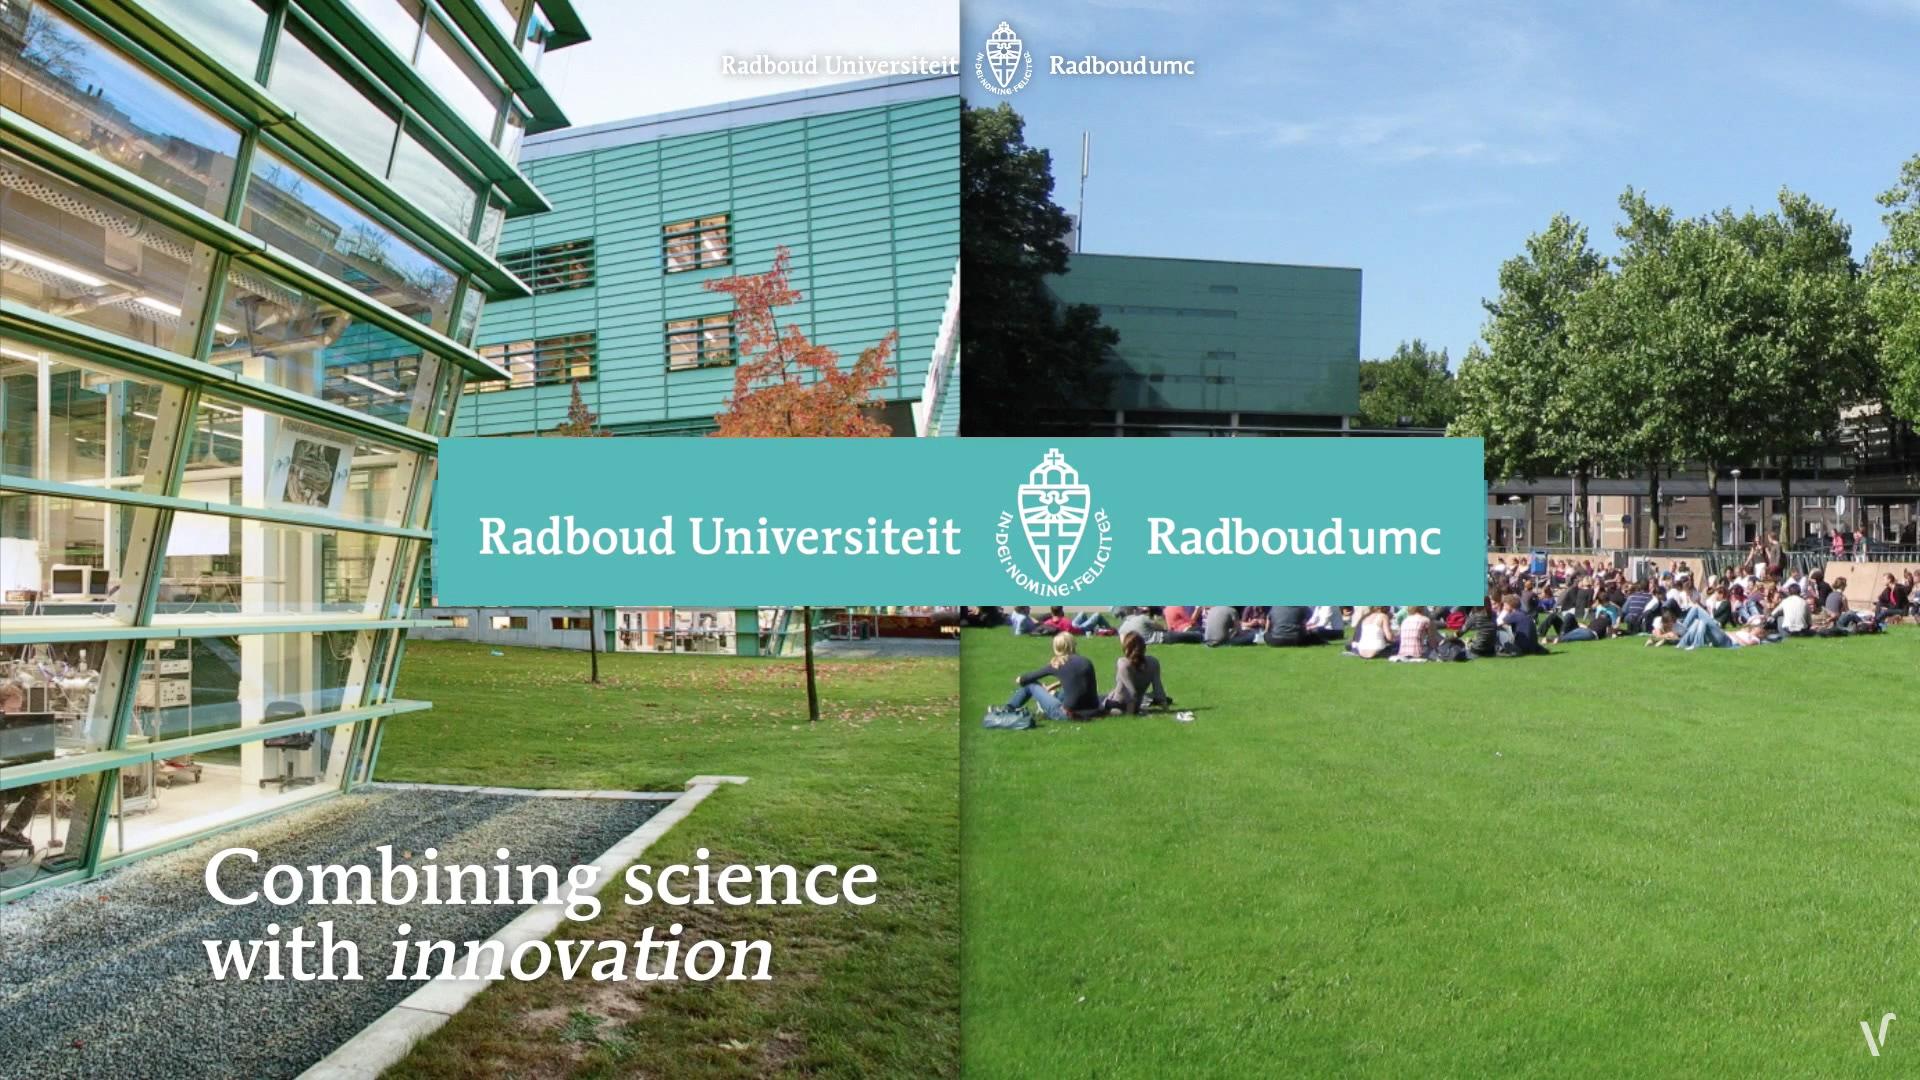 Image result for Radboud universiteit